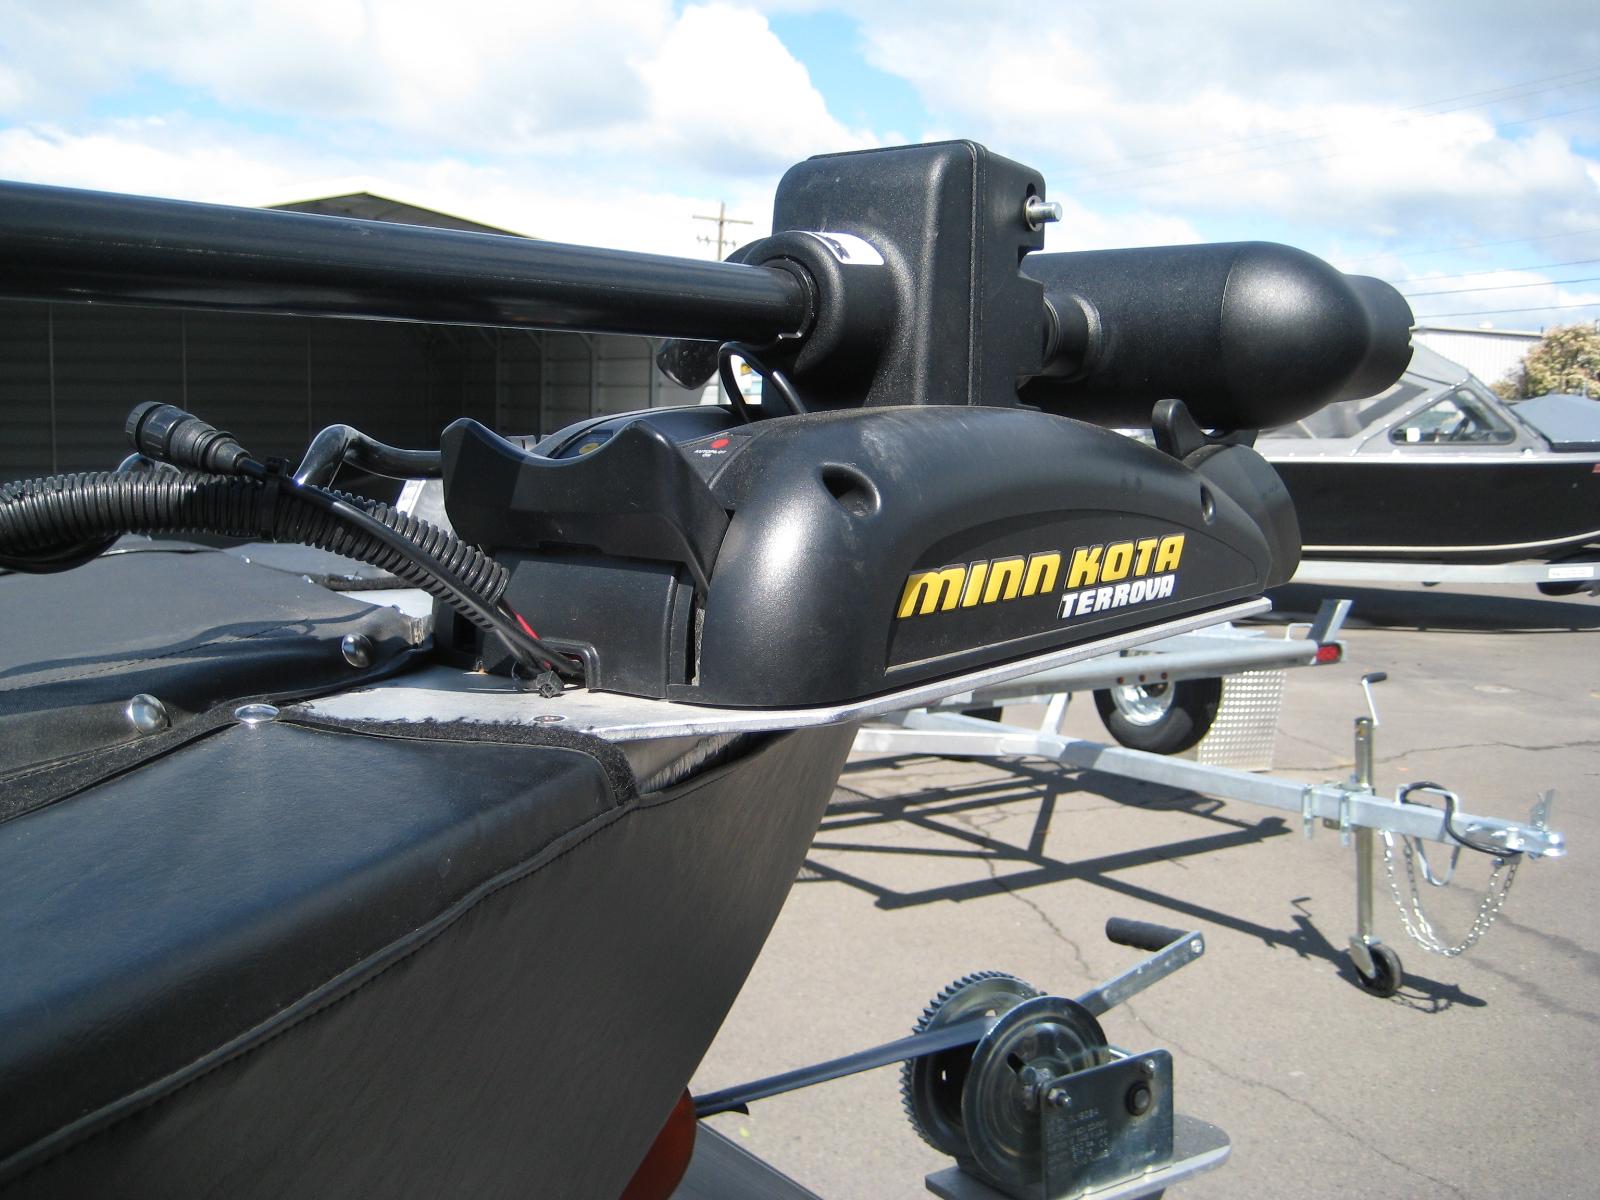 Willie Boats For Sale >> Minn Kota® Terrova 80 i-Pilot Bow Mount trolling Motor $1,000.00 OBO - Willie Boats